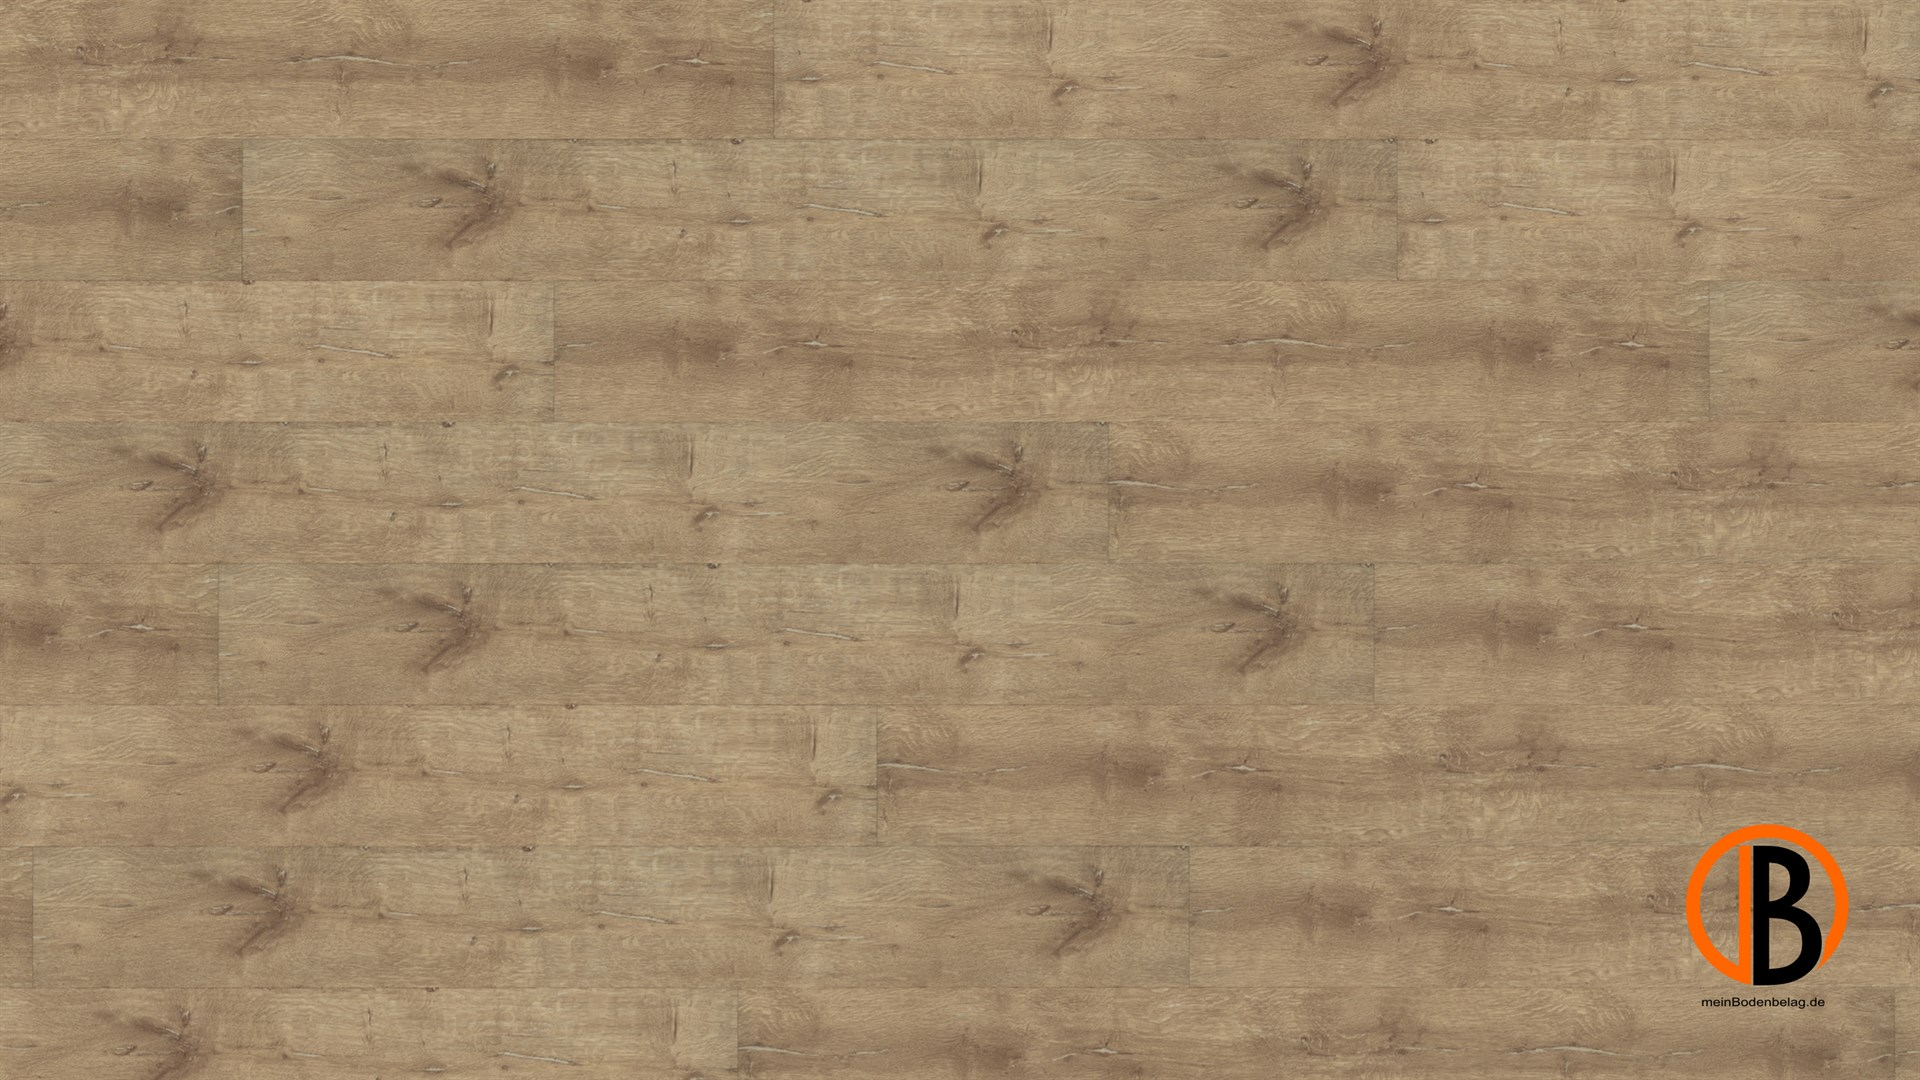 CINQUE KWG DESIGNERVINYL ANTIGUA INFINITY EXTEND SHEETS | 10000230;0 | Bild 1